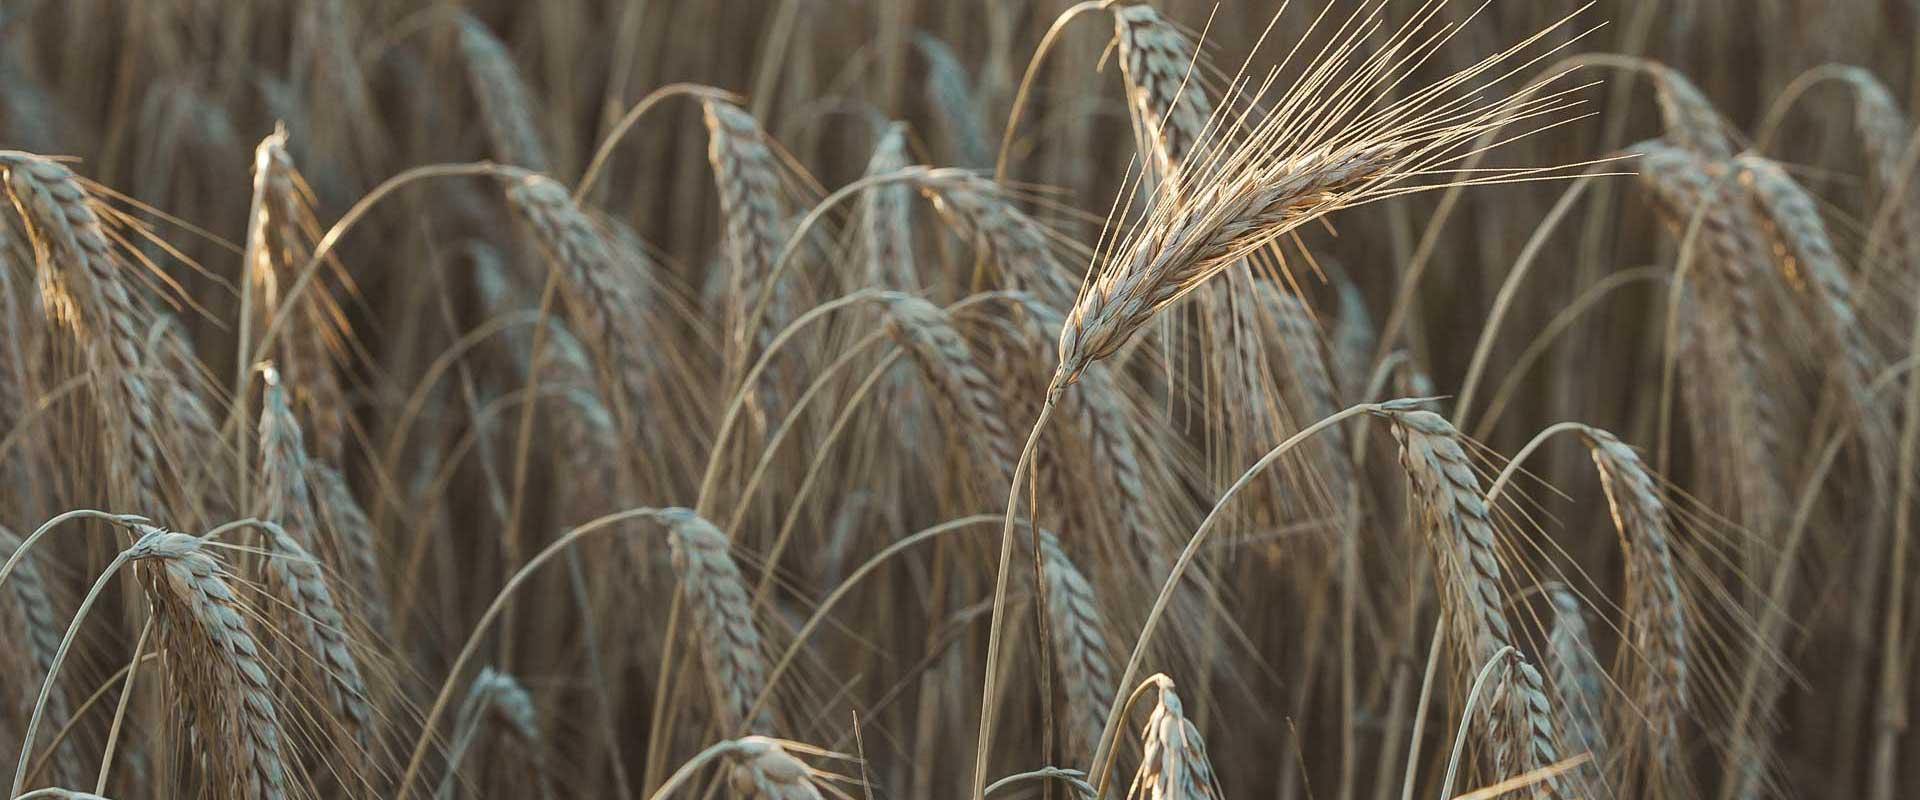 Weizenfeld Ähren Nahaufnahme